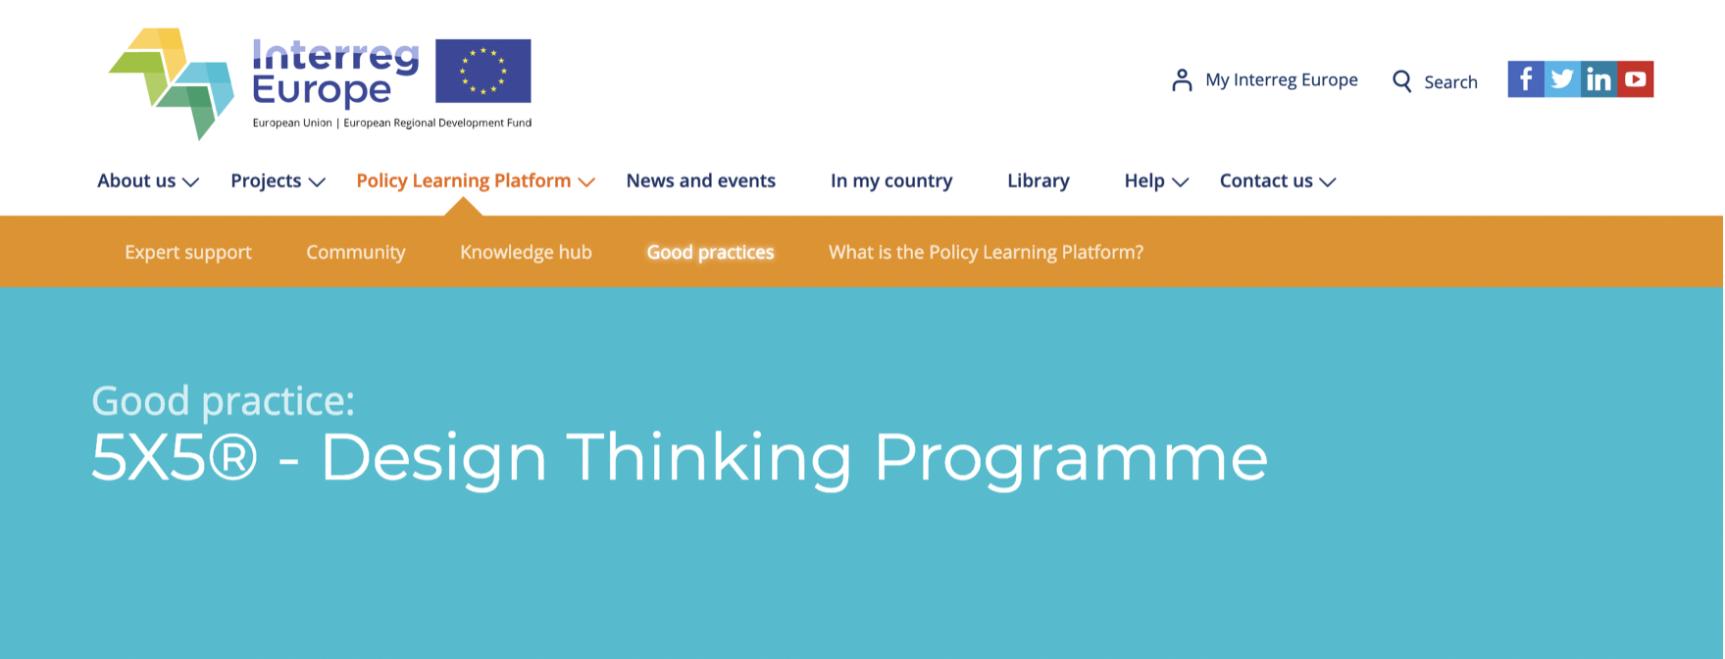 5X5 logo design thinking programma